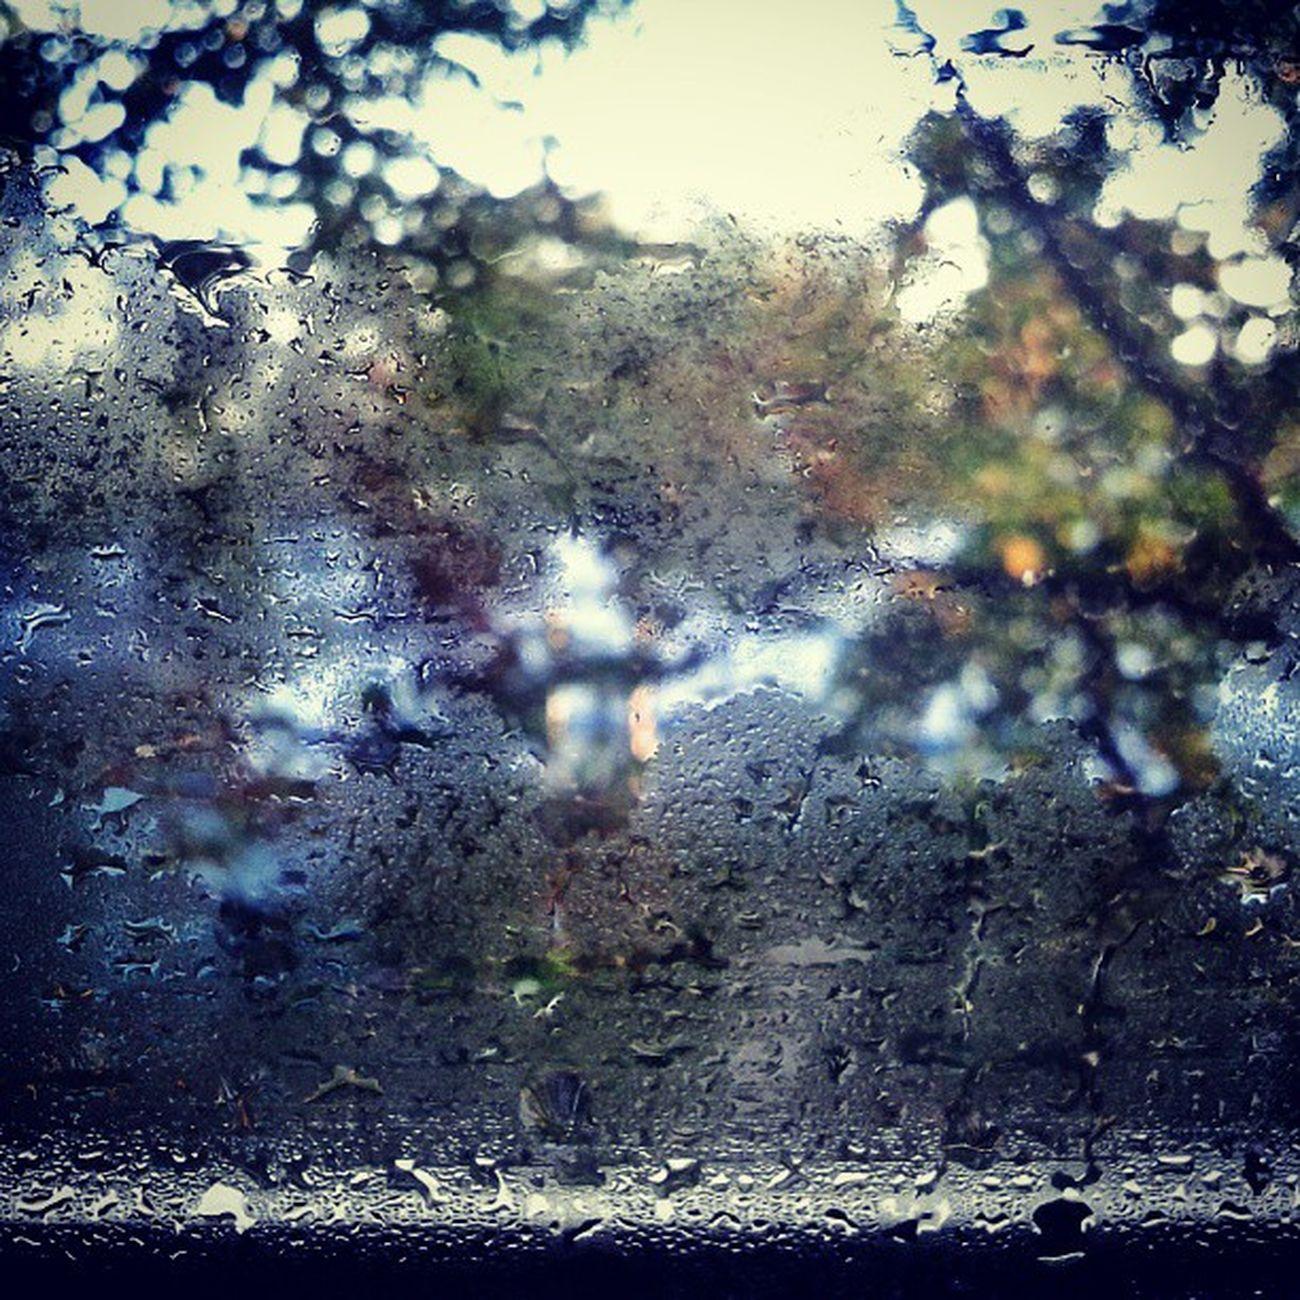 Drops on the glass. Rain Raining RainyDay Tagsforlikes pouring rainydays water clouds cloudy photooftheday puddle umbrella instagood gloomy rainyweather rainydayz wet splash TFLers downpour instarain Russia